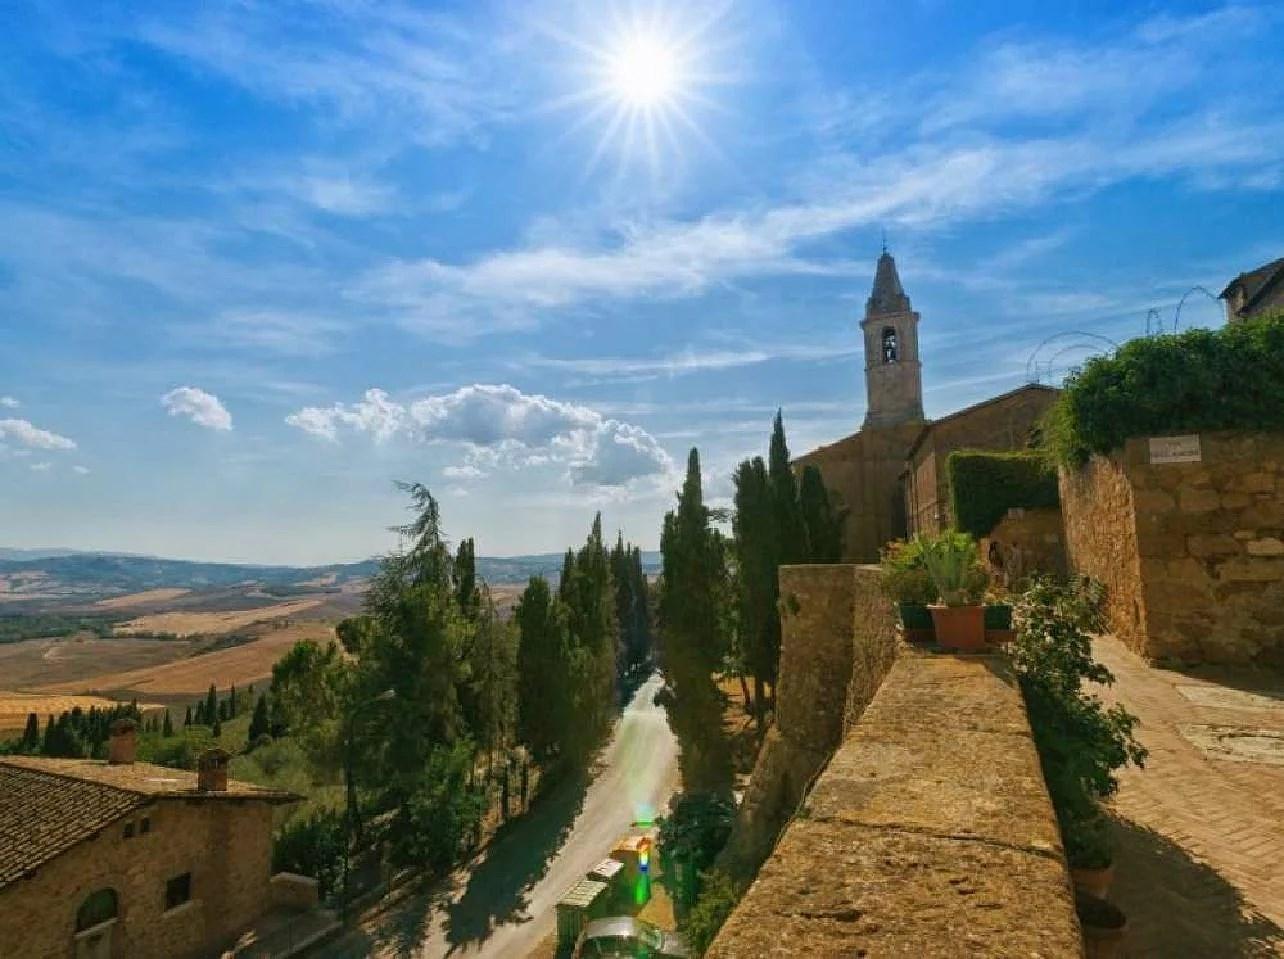 Pienza i regionen Toscana i Italien